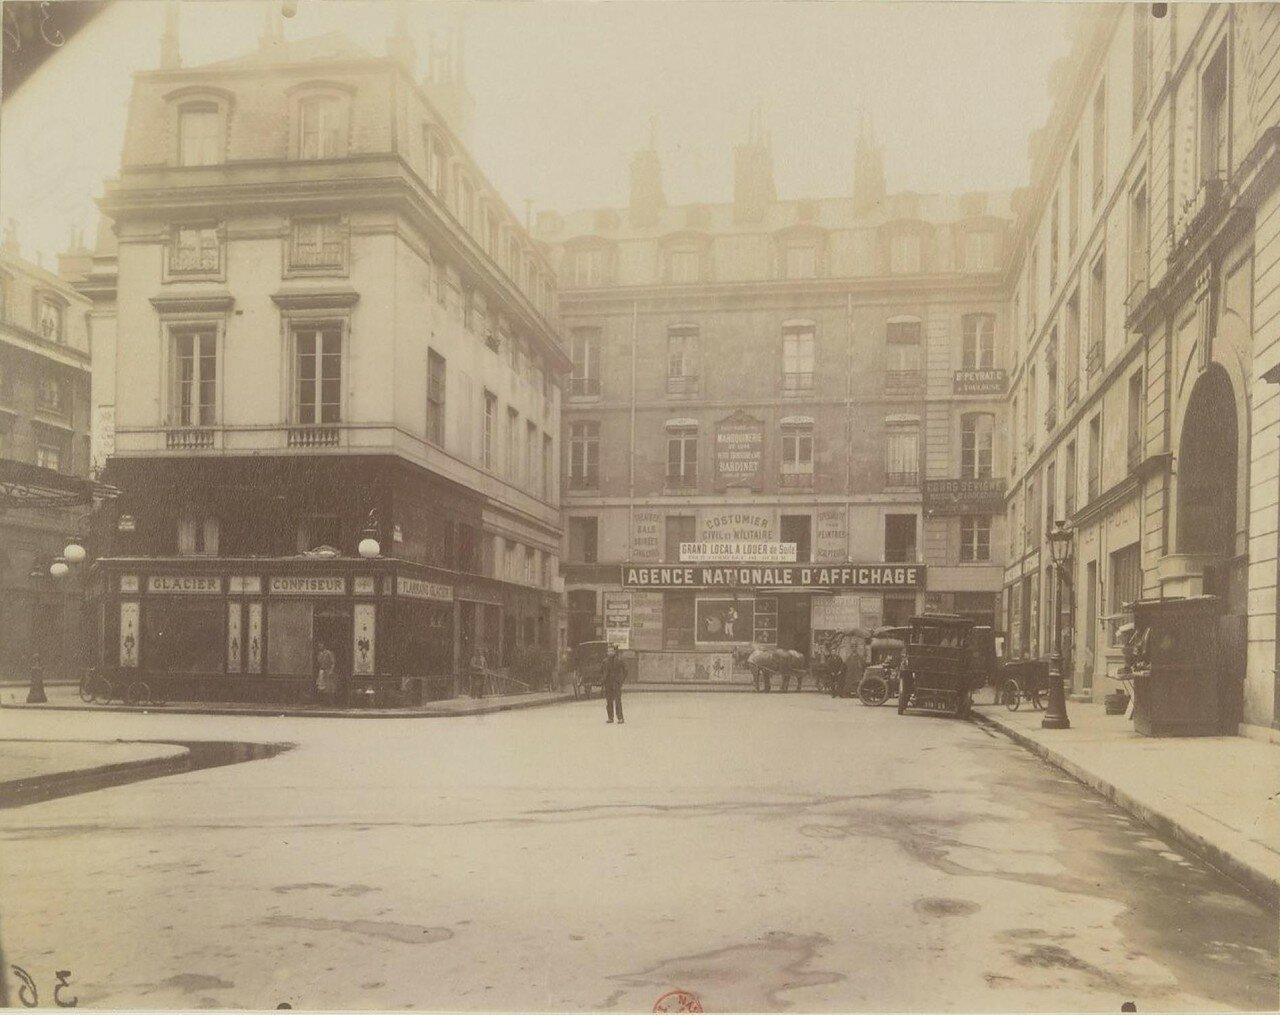 Площадь де Валуа. Вид из проулка Генриха IV. Июнь